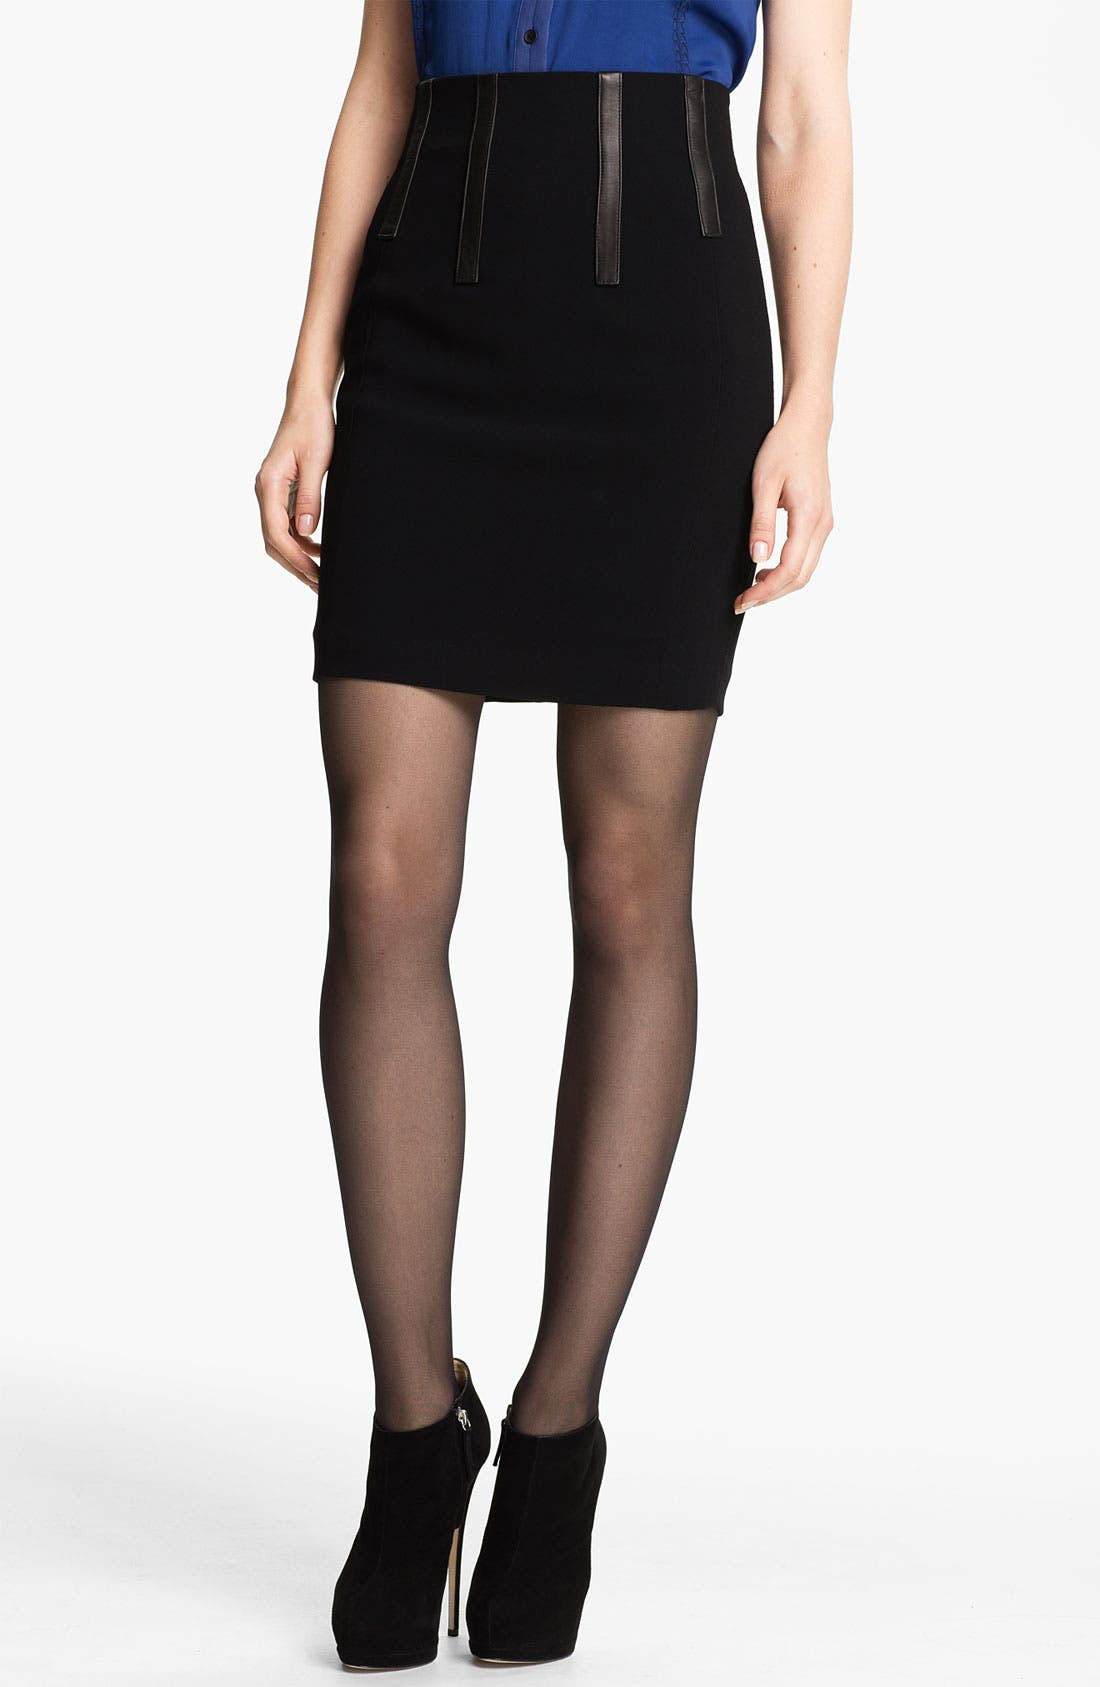 Main Image - rag & bone 'Imogen' Leather Trim Skirt